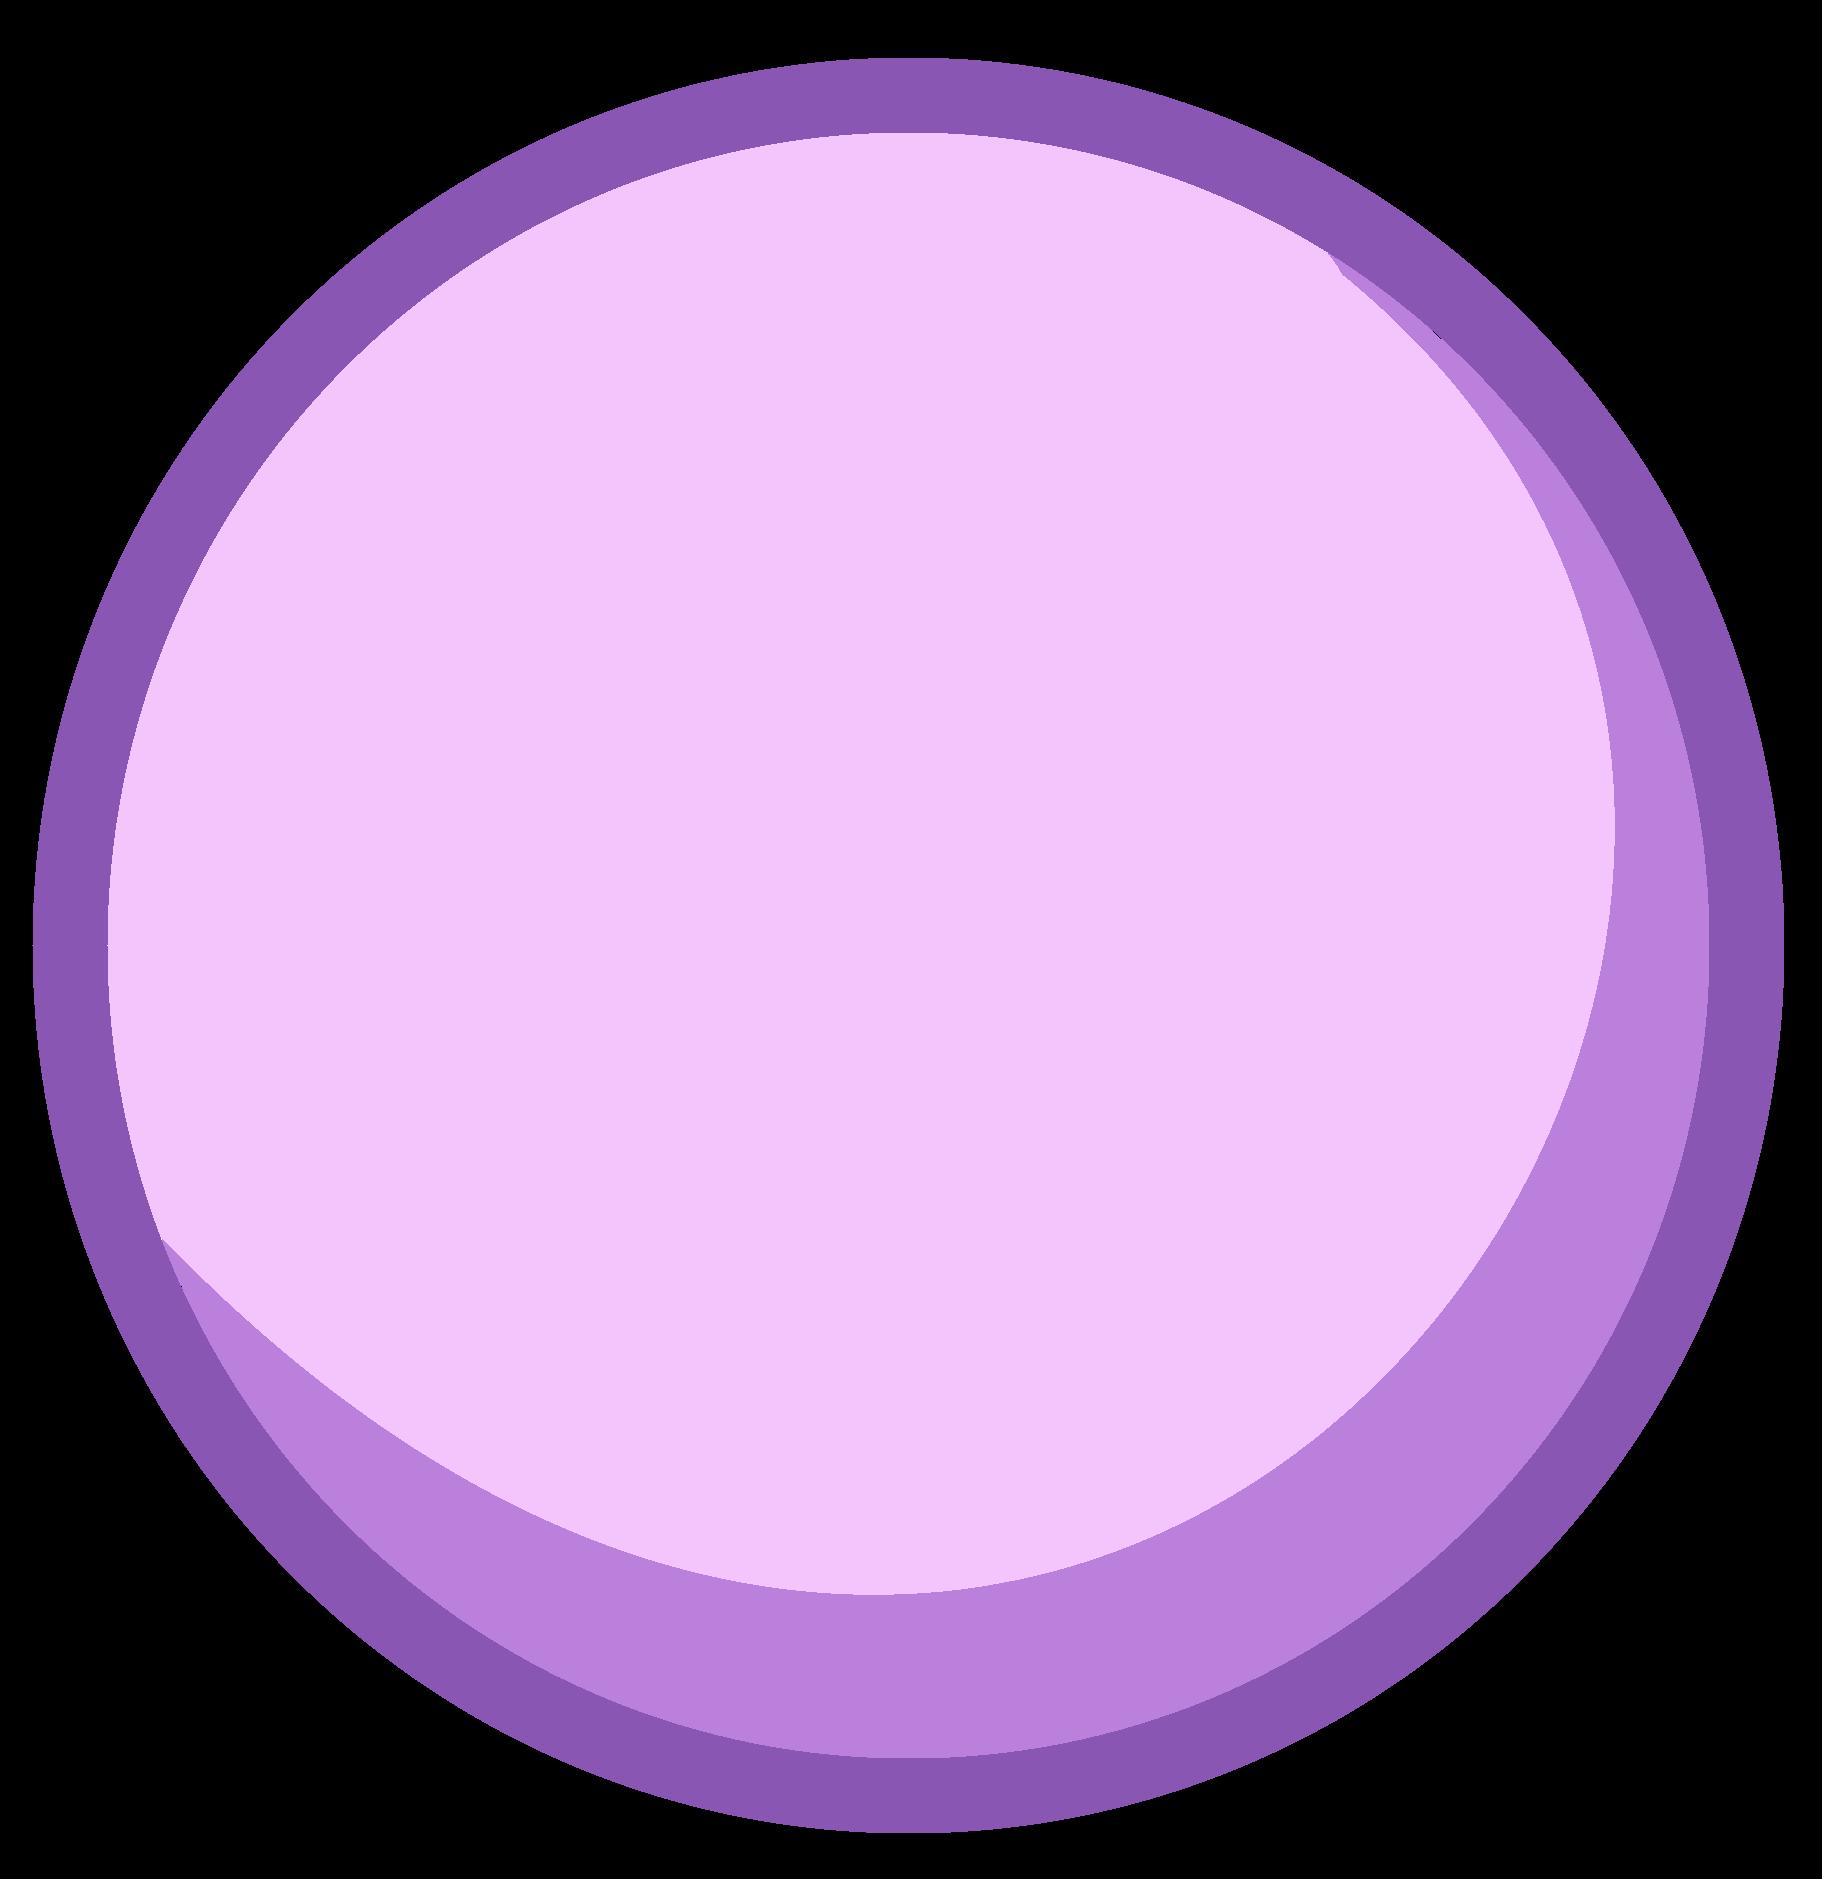 Gem clipart hard object. Mauve pearl kjd wiki